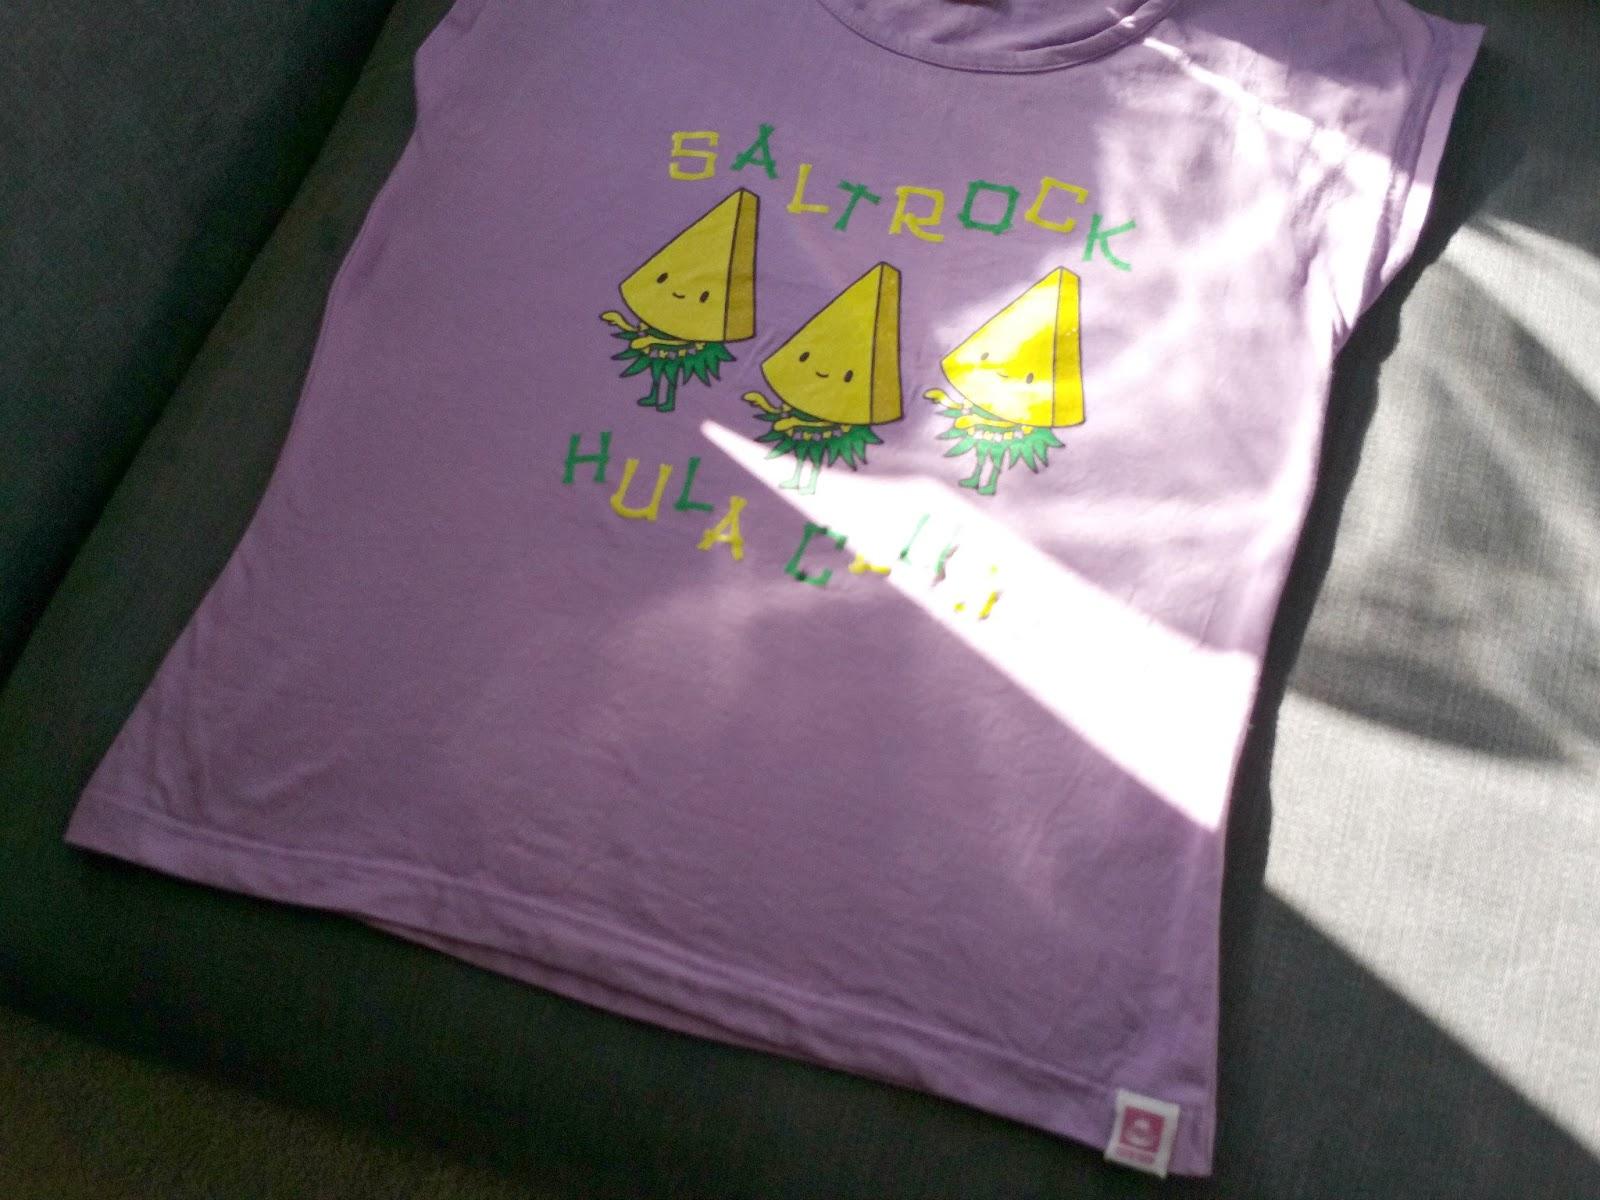 Saltrock Clothing, Surfer clothes for Kids, children fashion